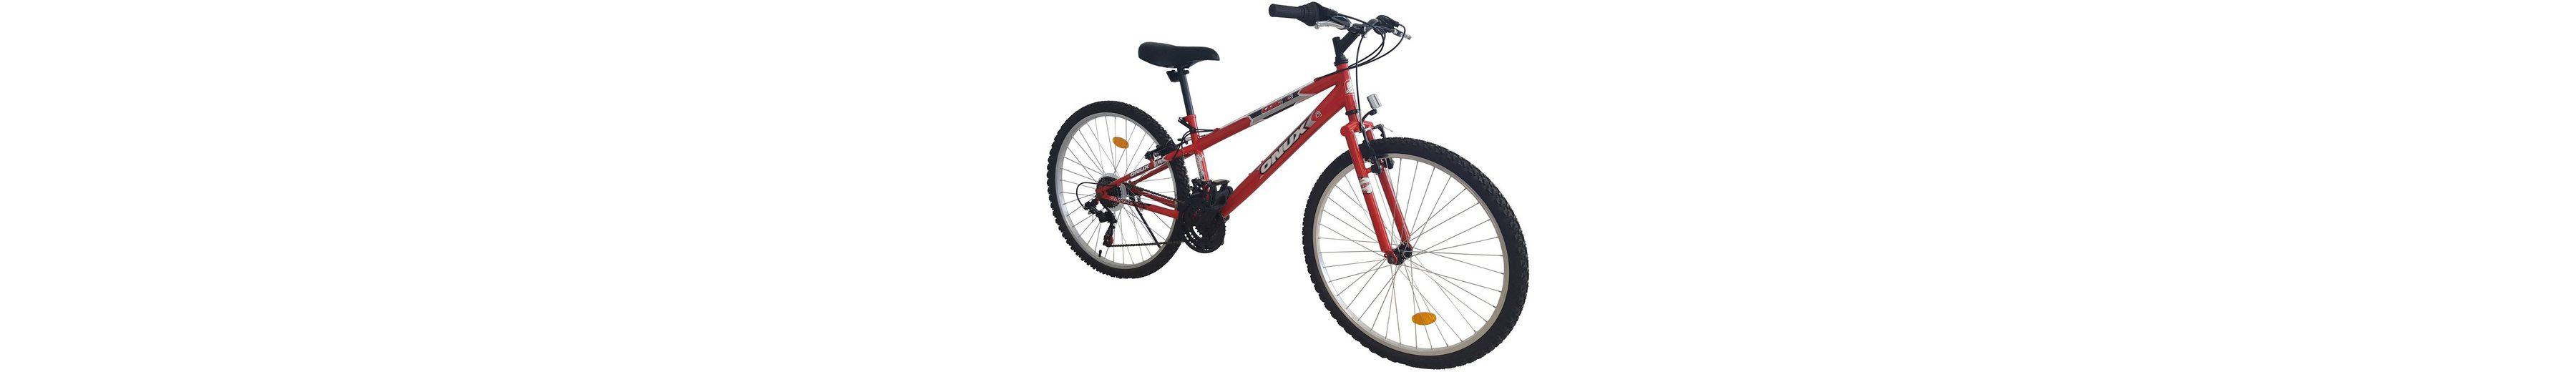 "Mountainbike (Damen) »""Cruzader"", 66,04 cm (26 Zoll)«"